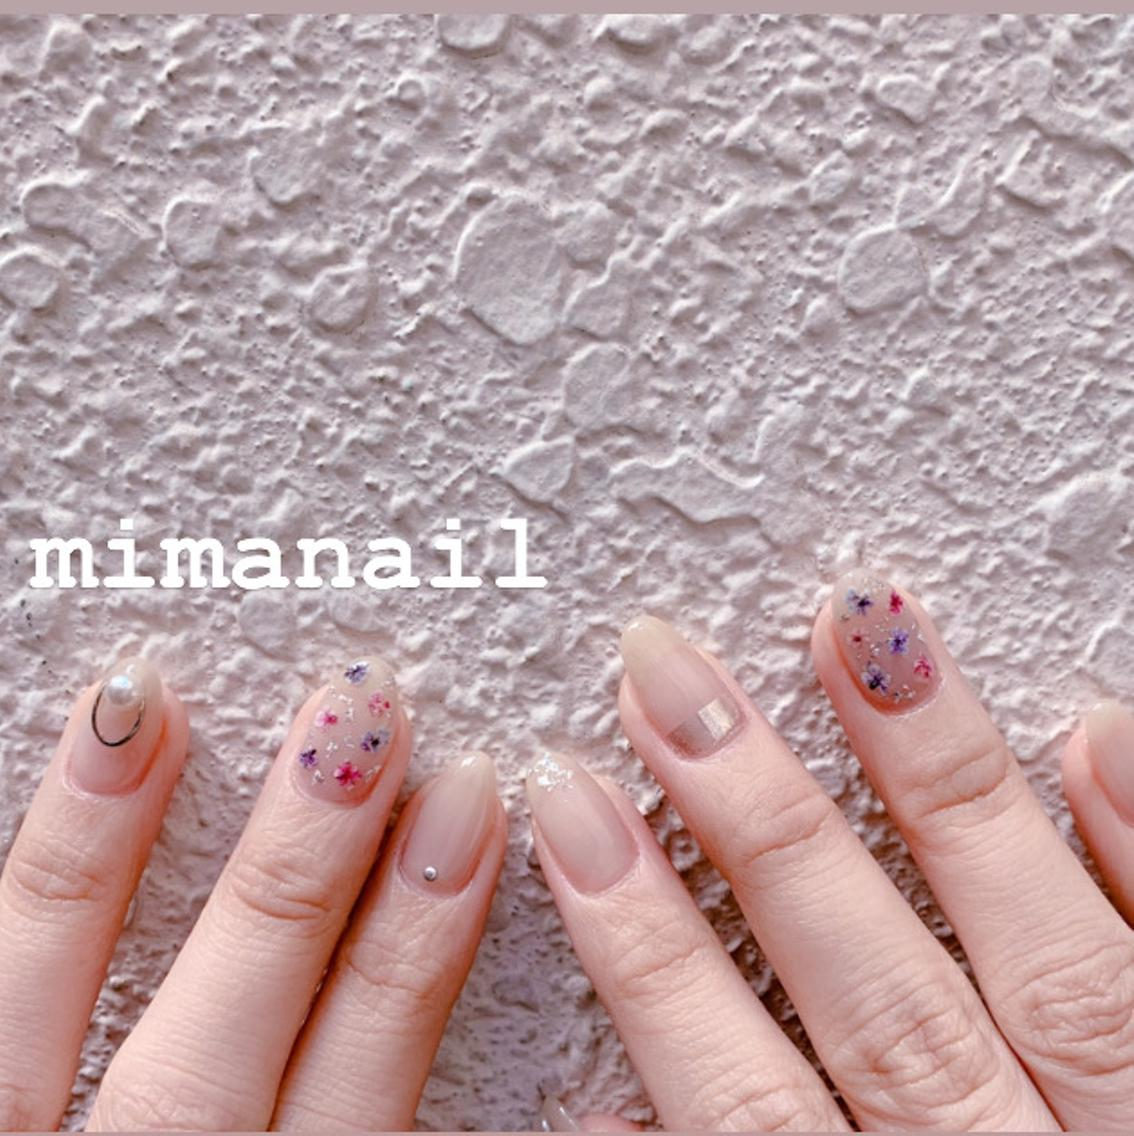 mimanail所属・mimanailの掲載